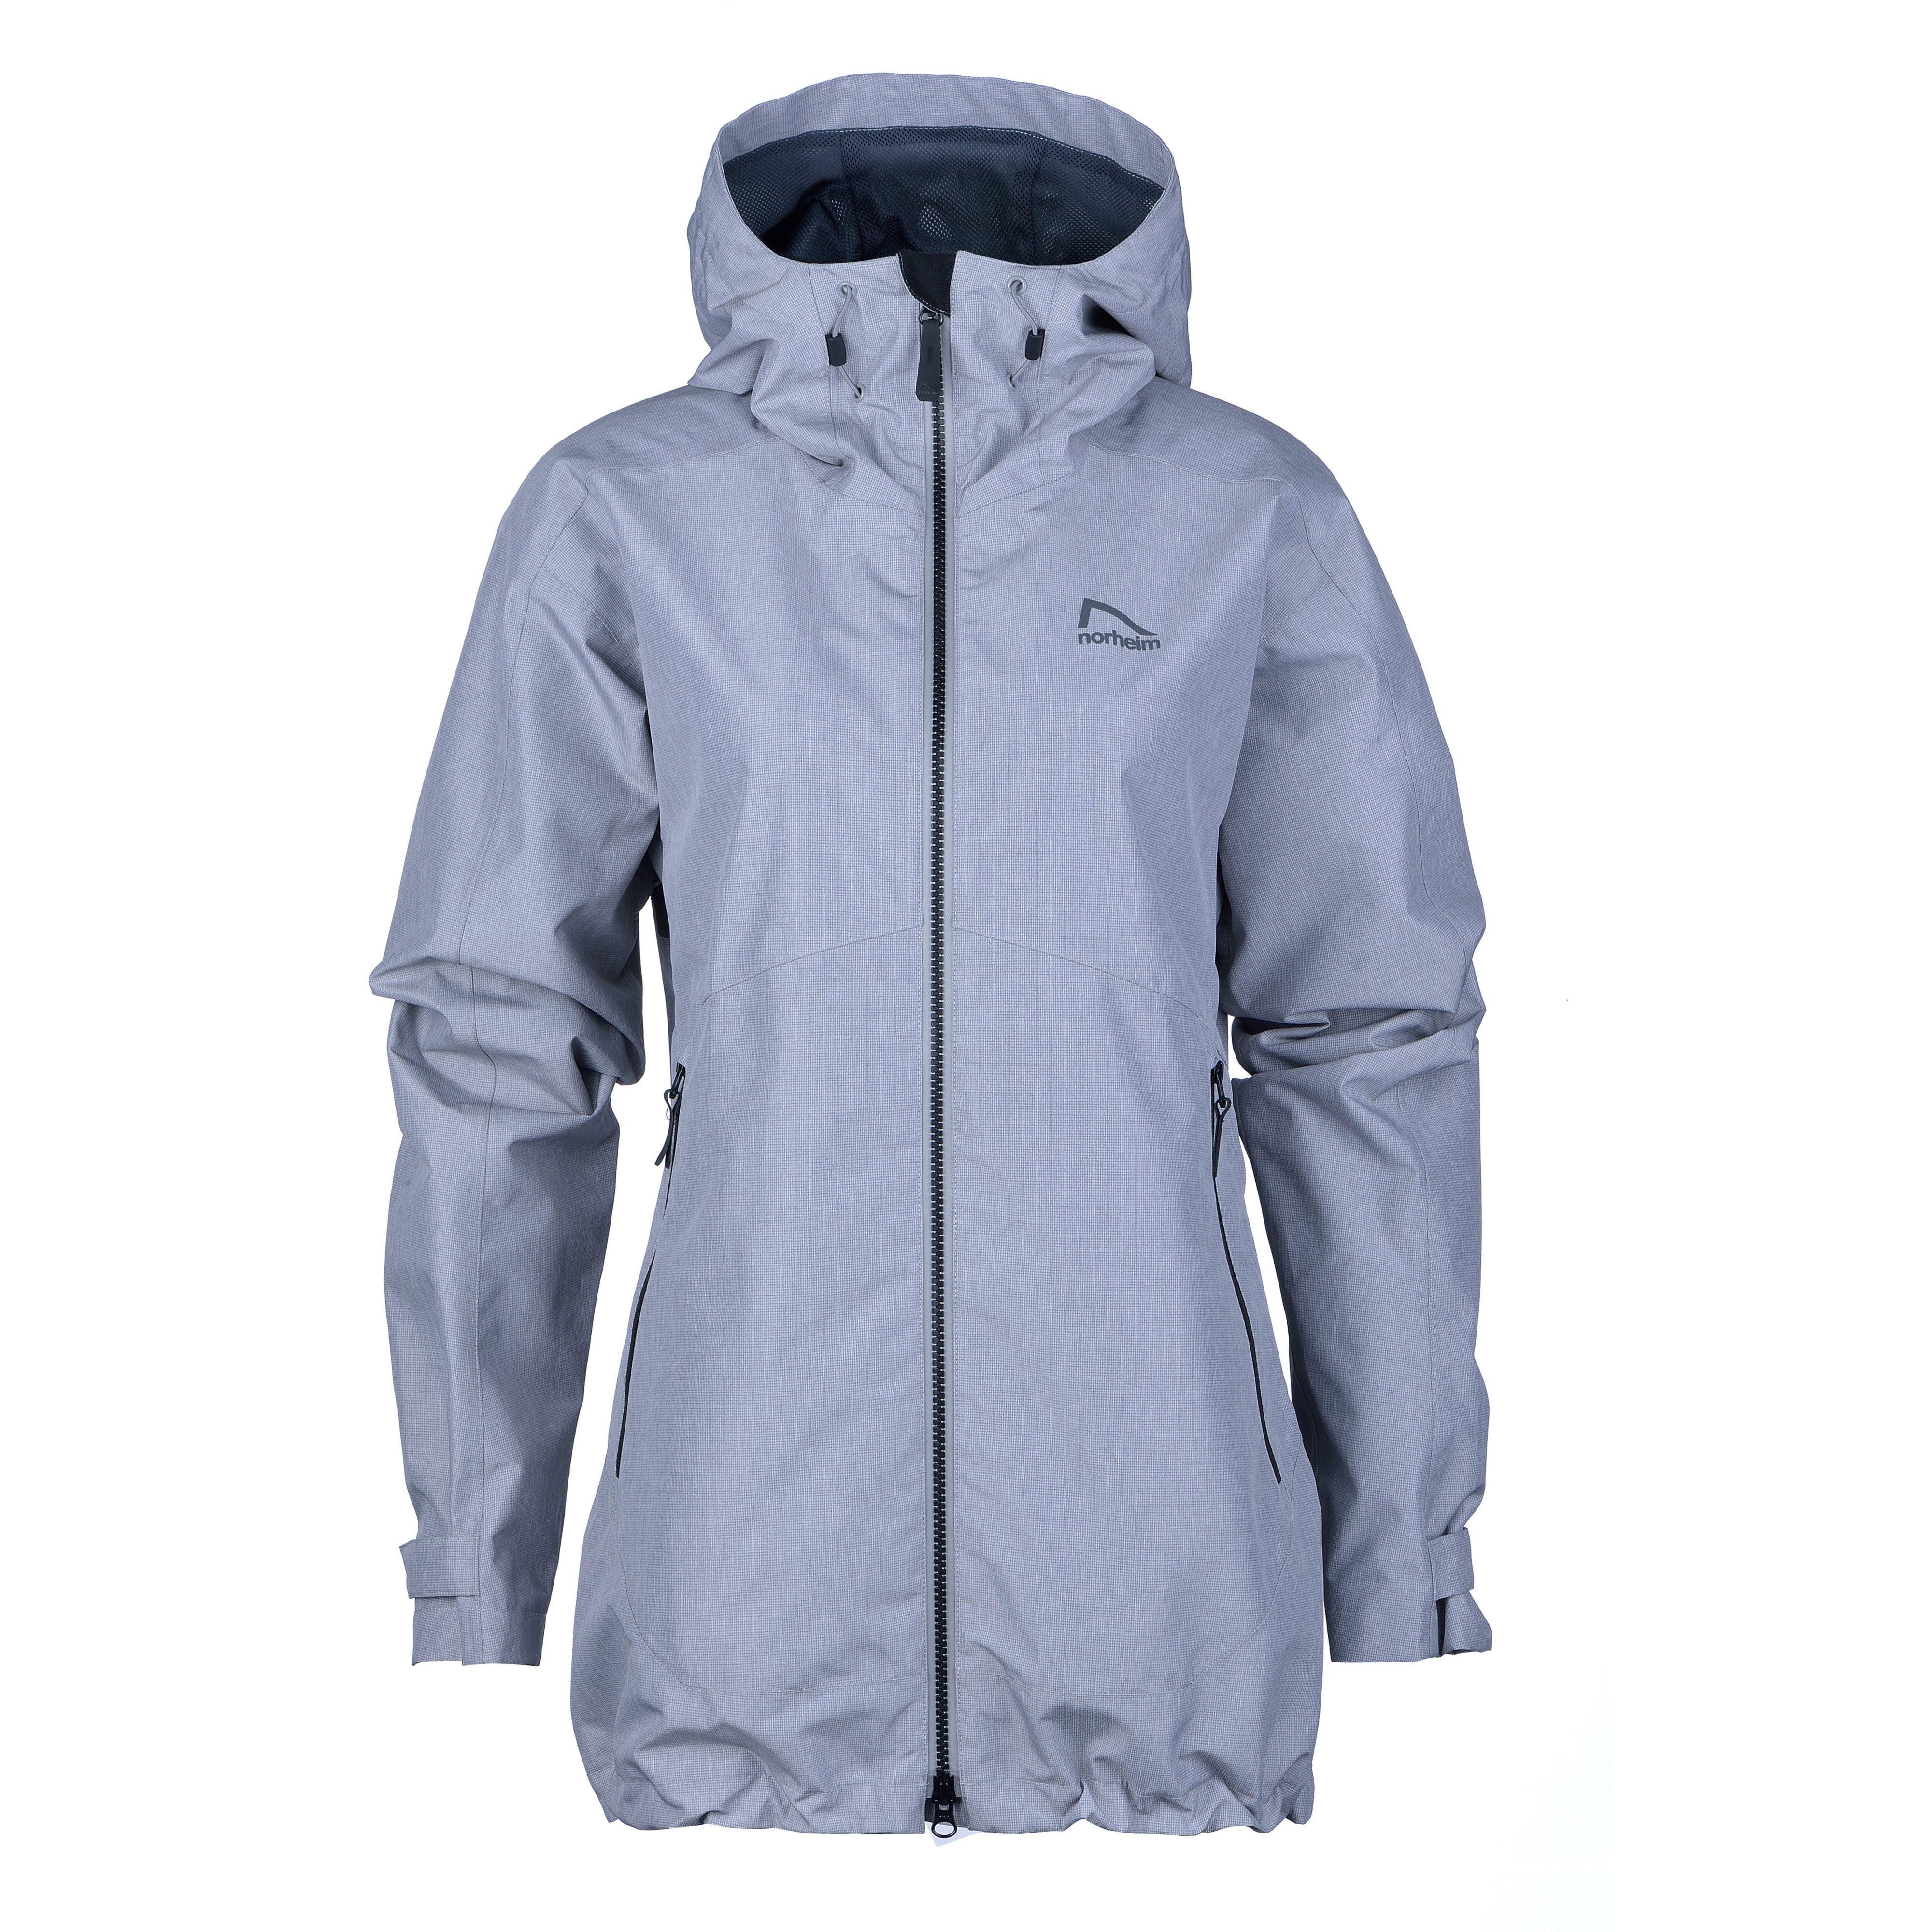 b022cd35 Norheim Granitt 2-lags jakke W's - frost gray - Lillehammer sport